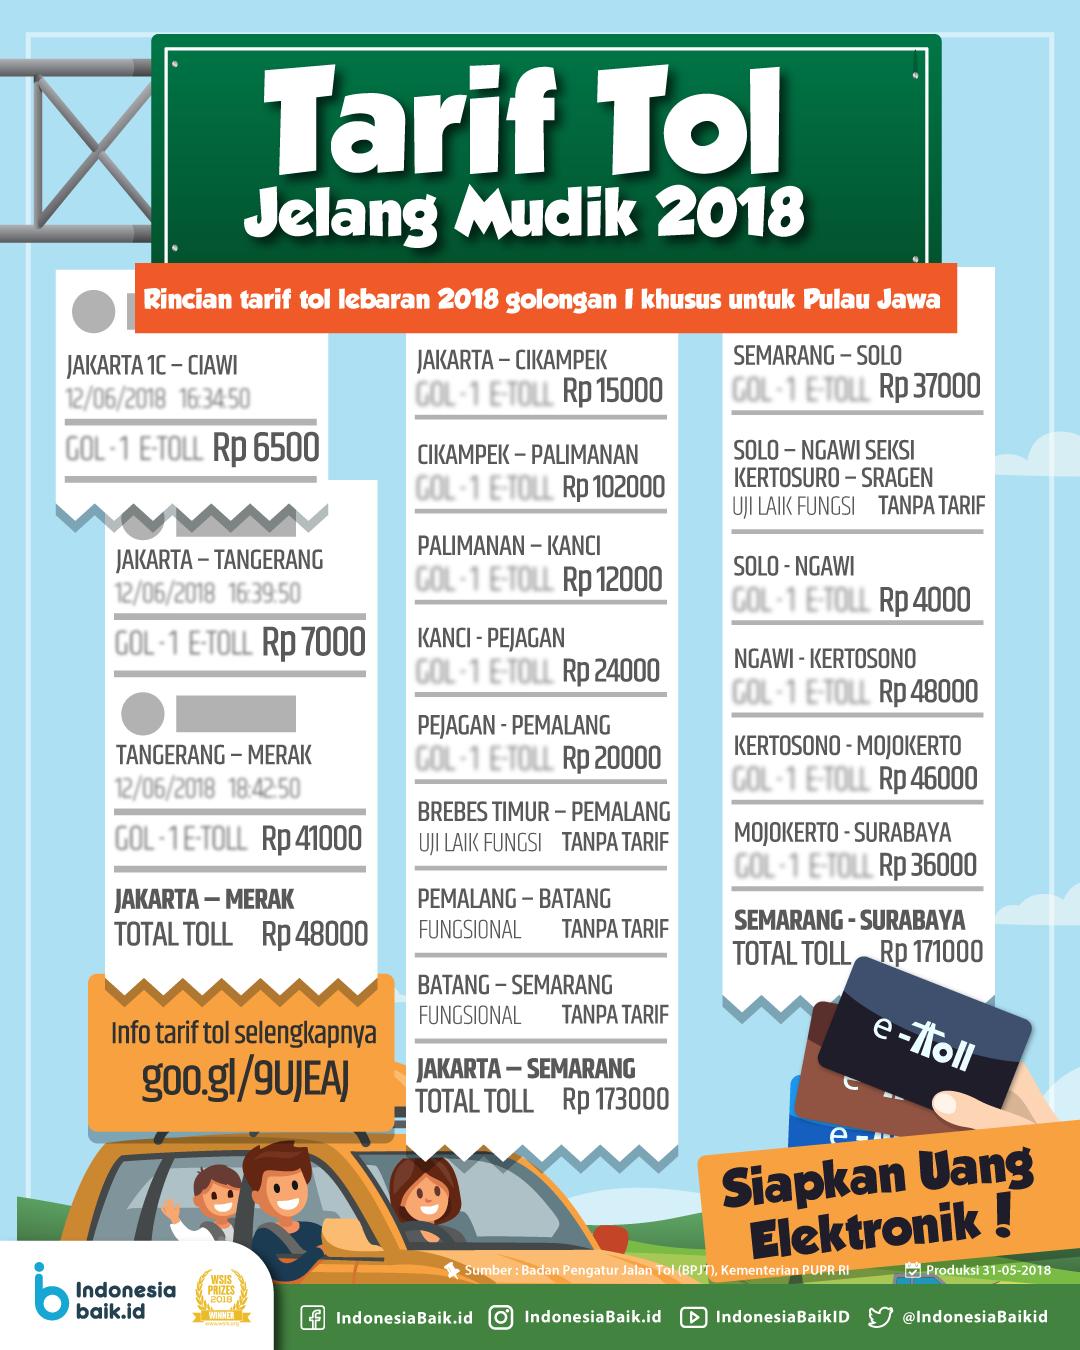 Tarif Tol Jelang Mudik 2018